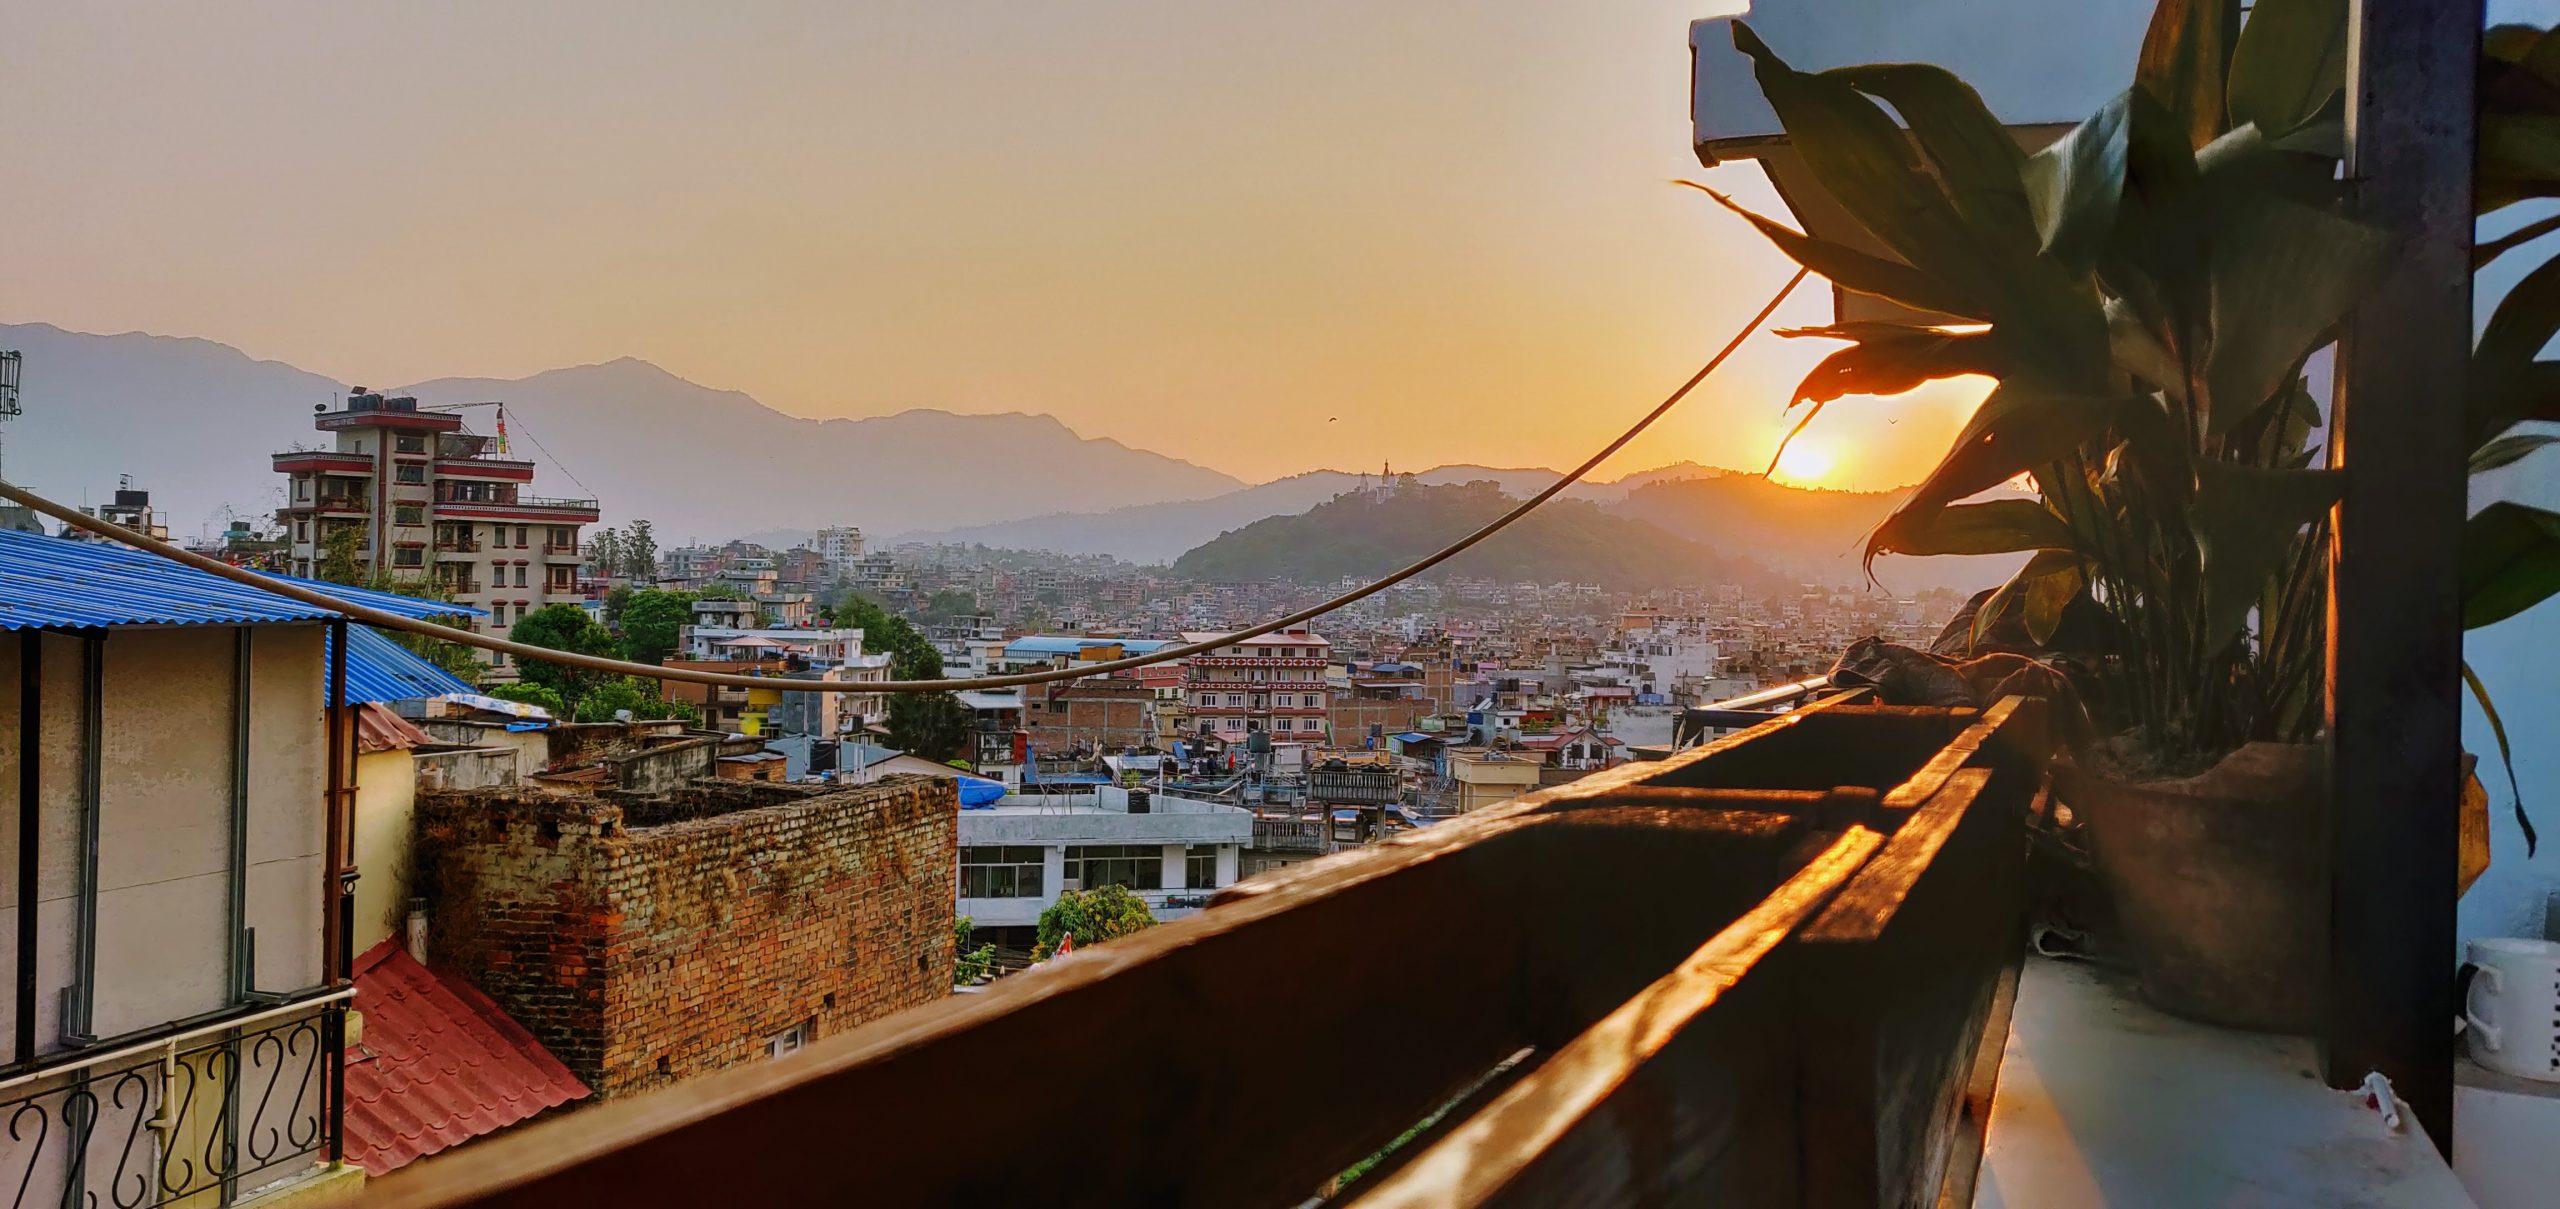 Community - Yog Hostel, Kathmandu. Photo: Jennifer Richardson